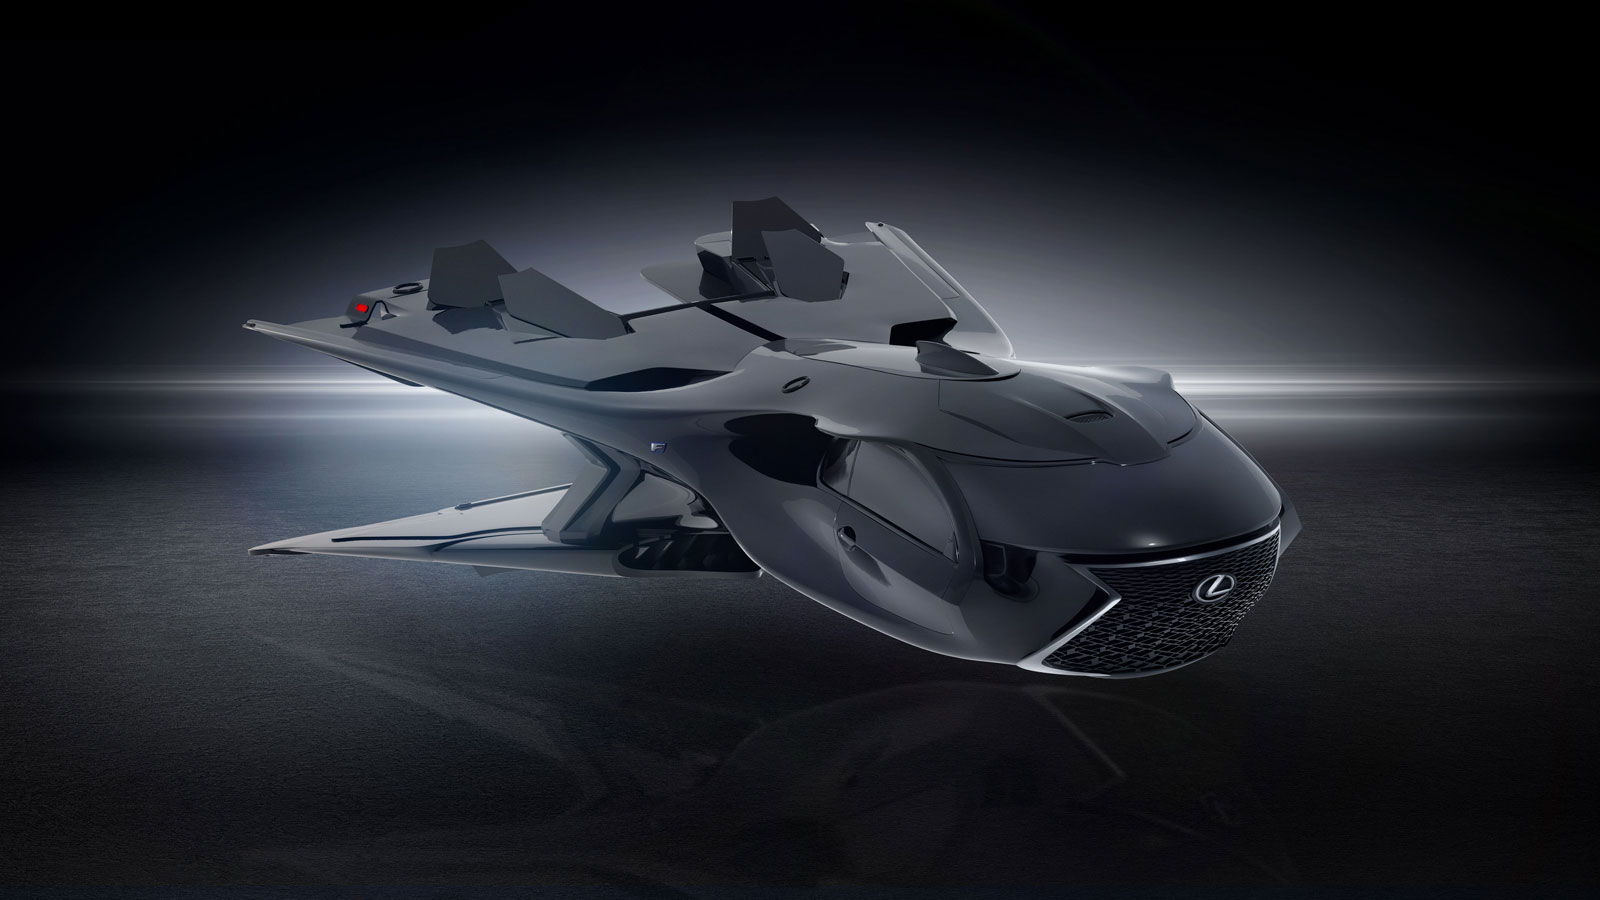 Men In Black International Lexus Jet Concept Car Body Design